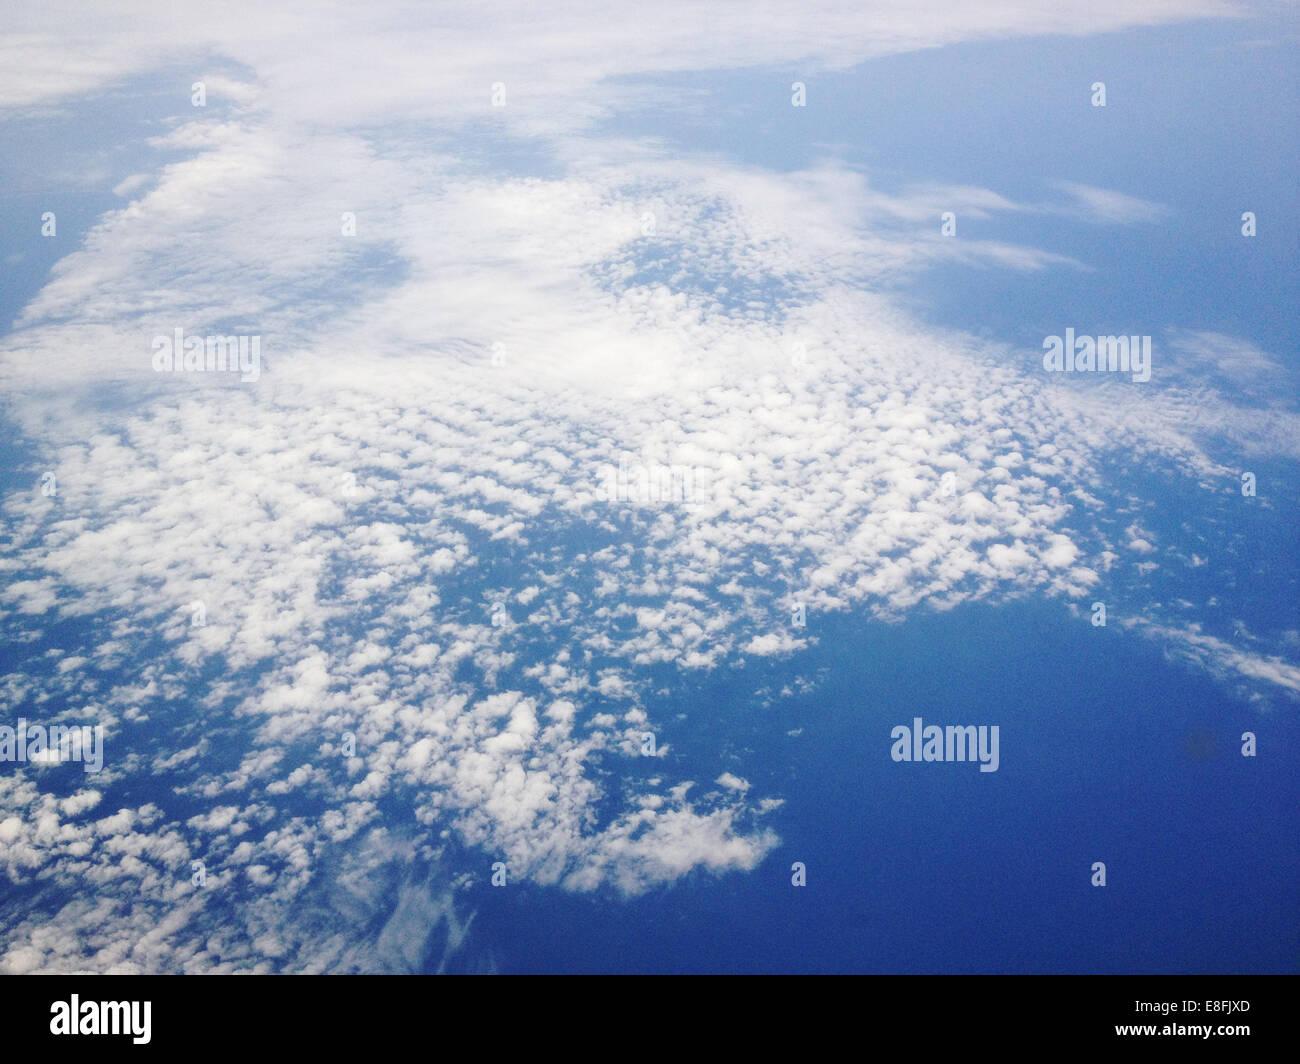 Dinamarca, nubes cirrus desde arriba Imagen De Stock